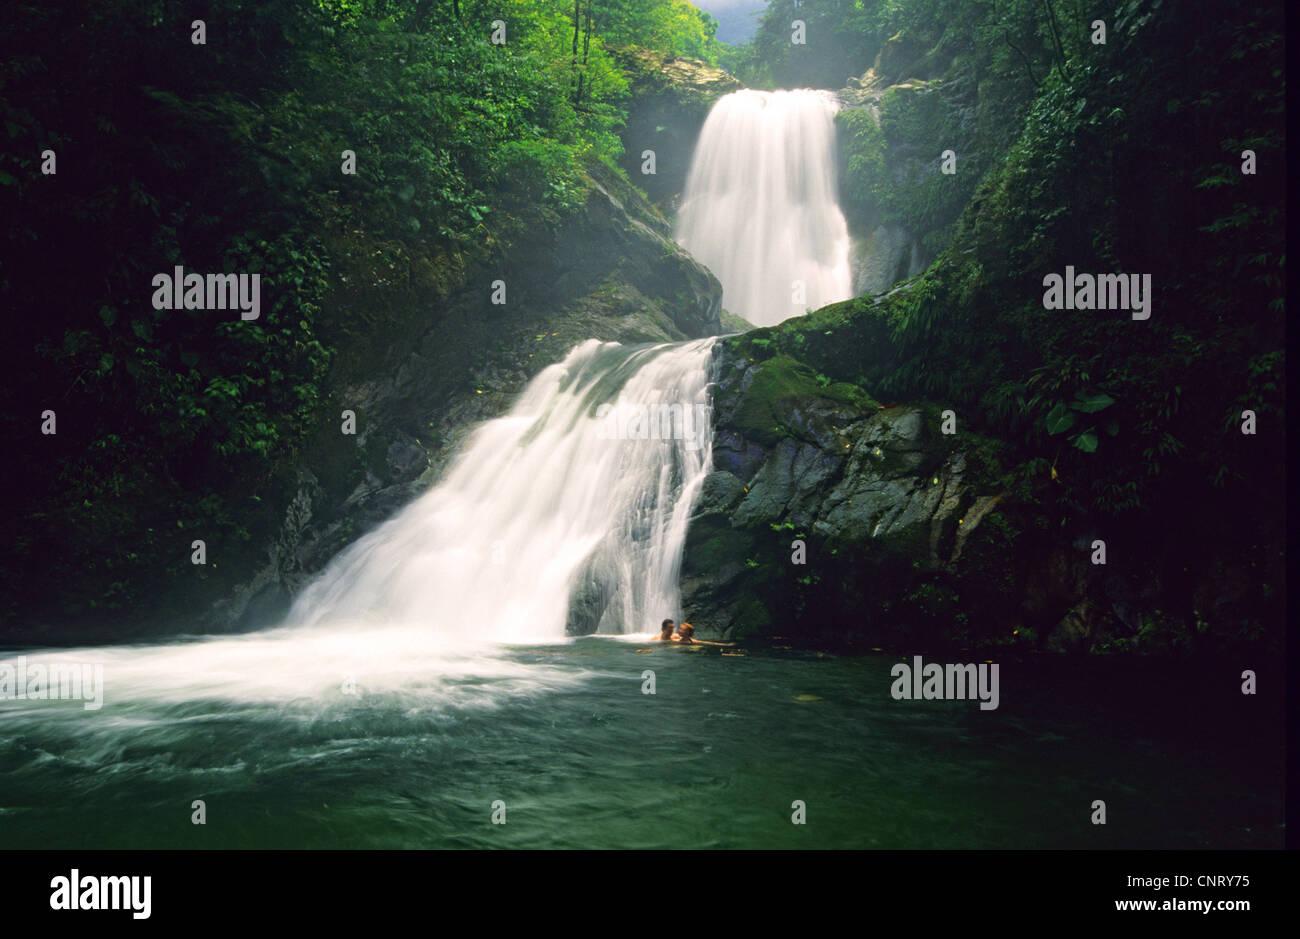 Unbelievable Falls, Pico Bonito National Park. - Stock Image